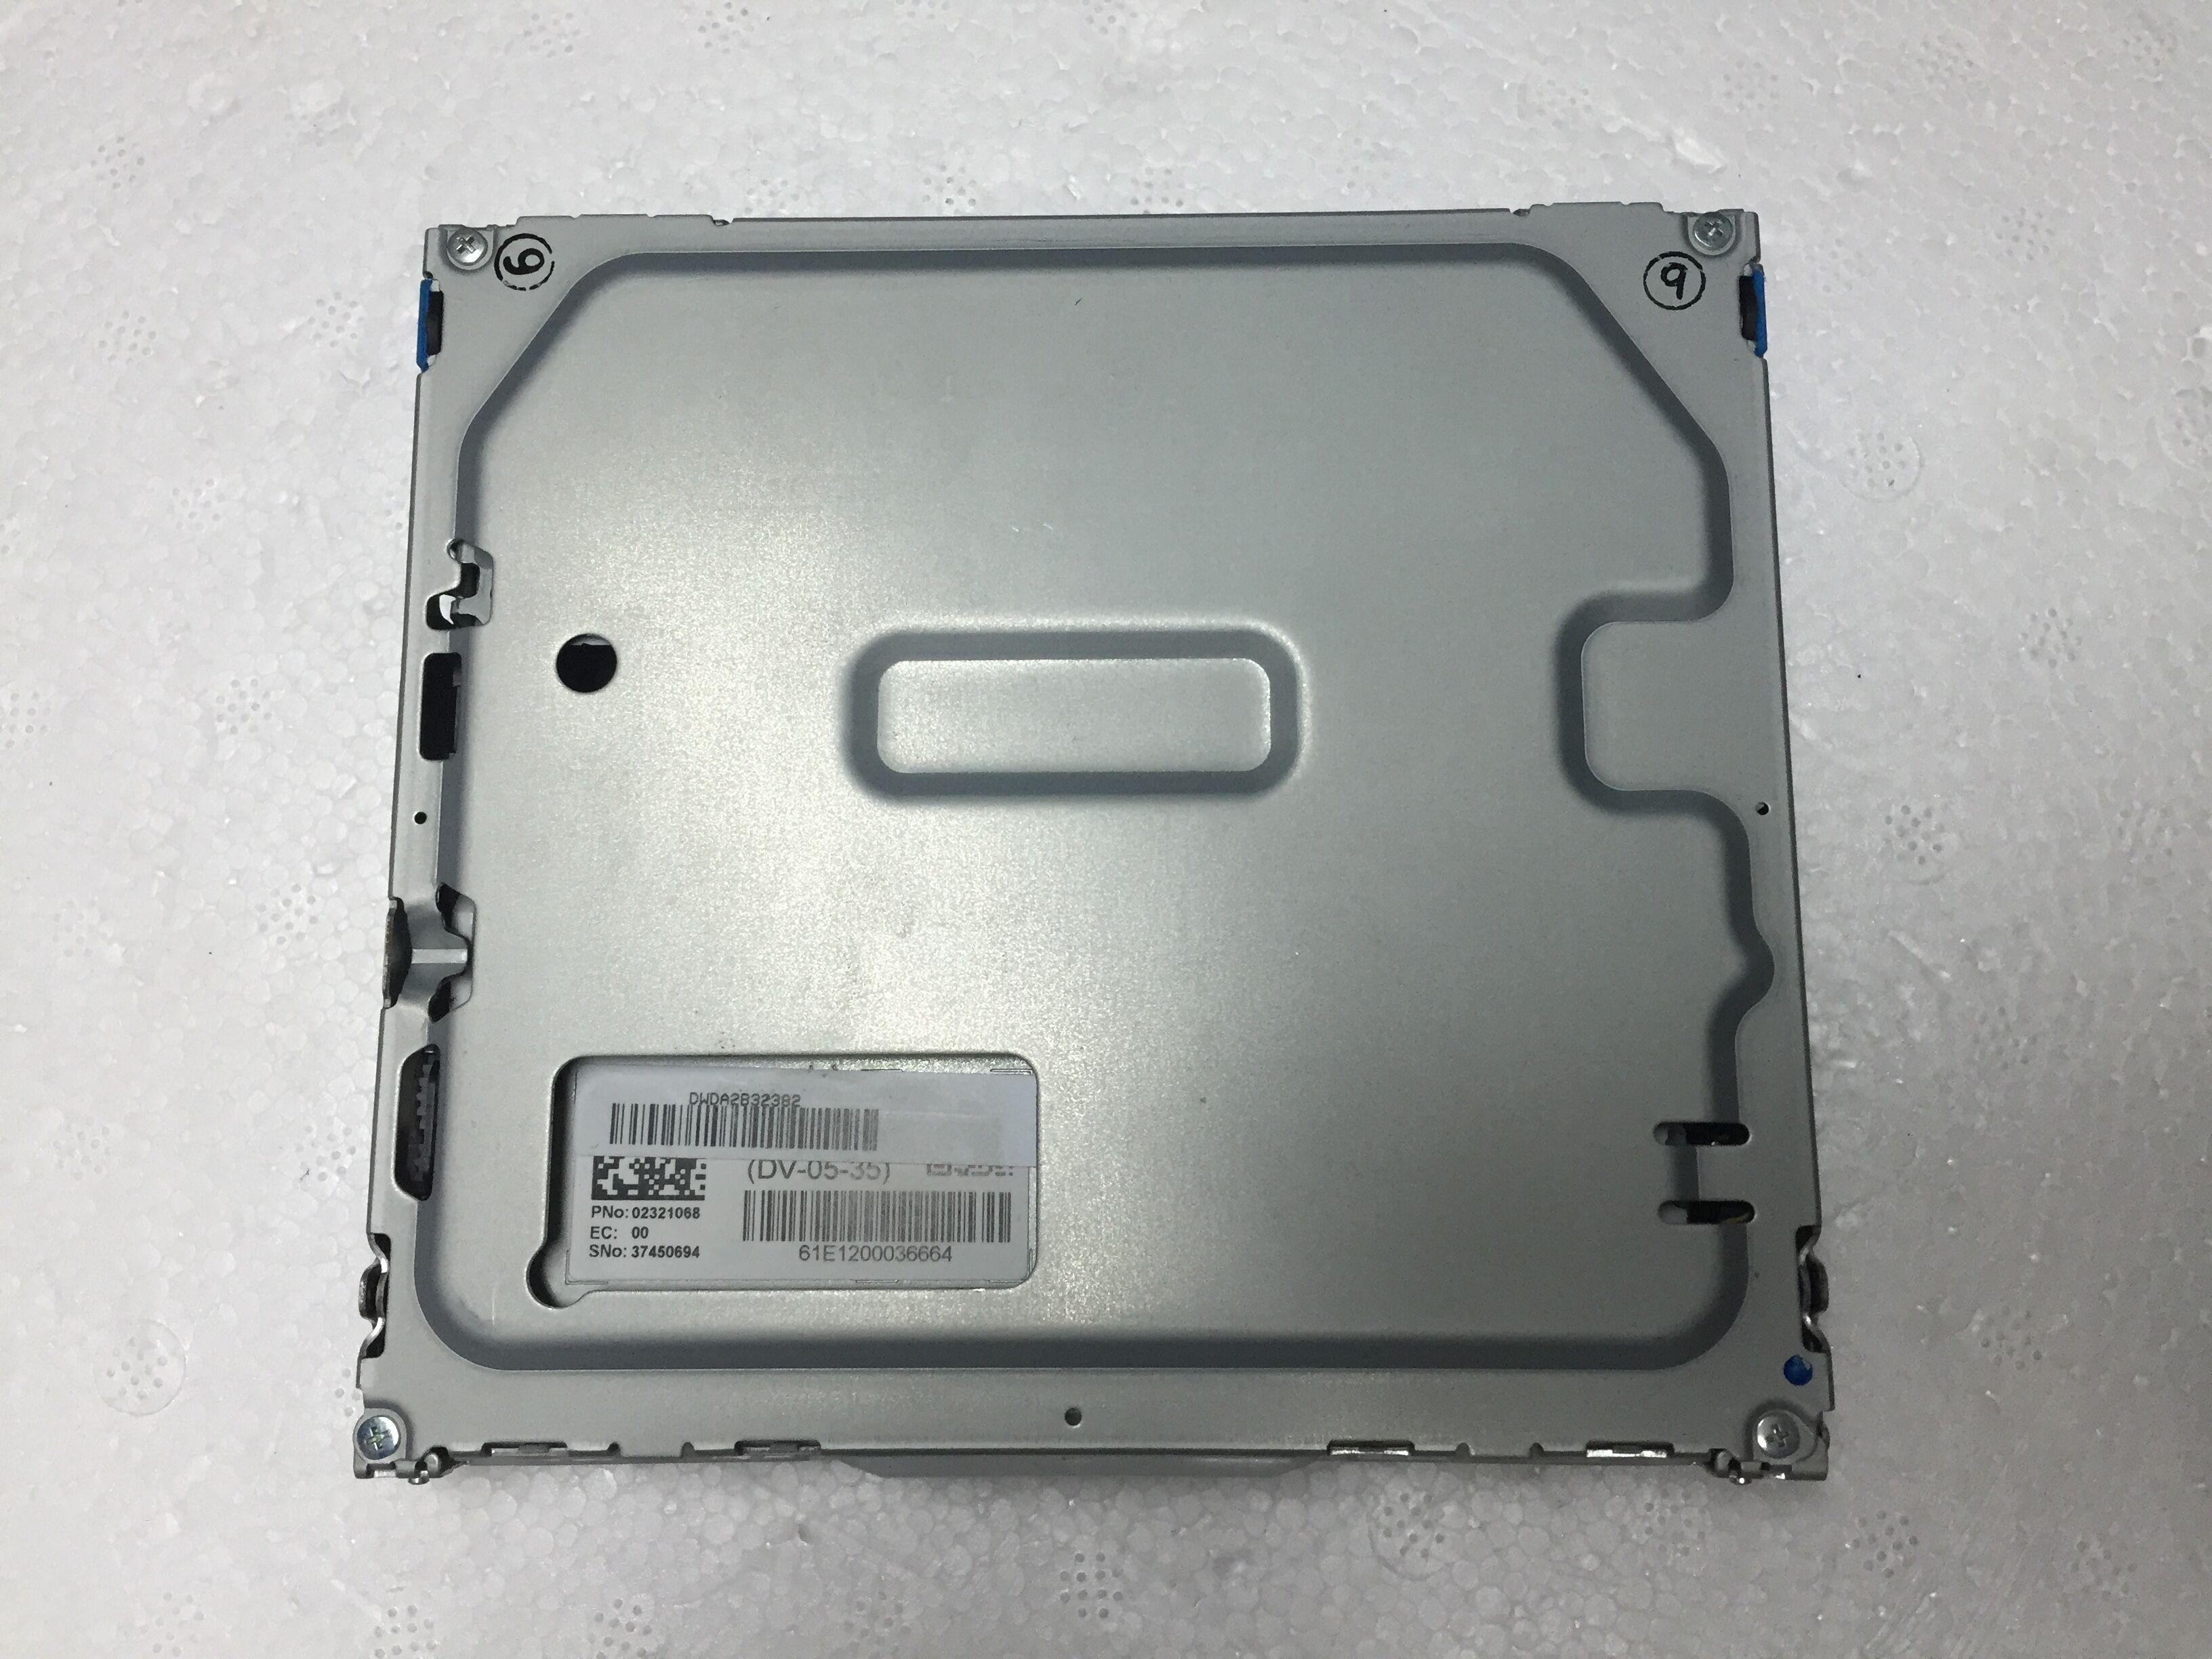 Original new DV-05-30/DV-05-35/ DV-05 DVD loader navigation mechanism for Toyota chrysler BMW X5 car DVD audio GPS systems